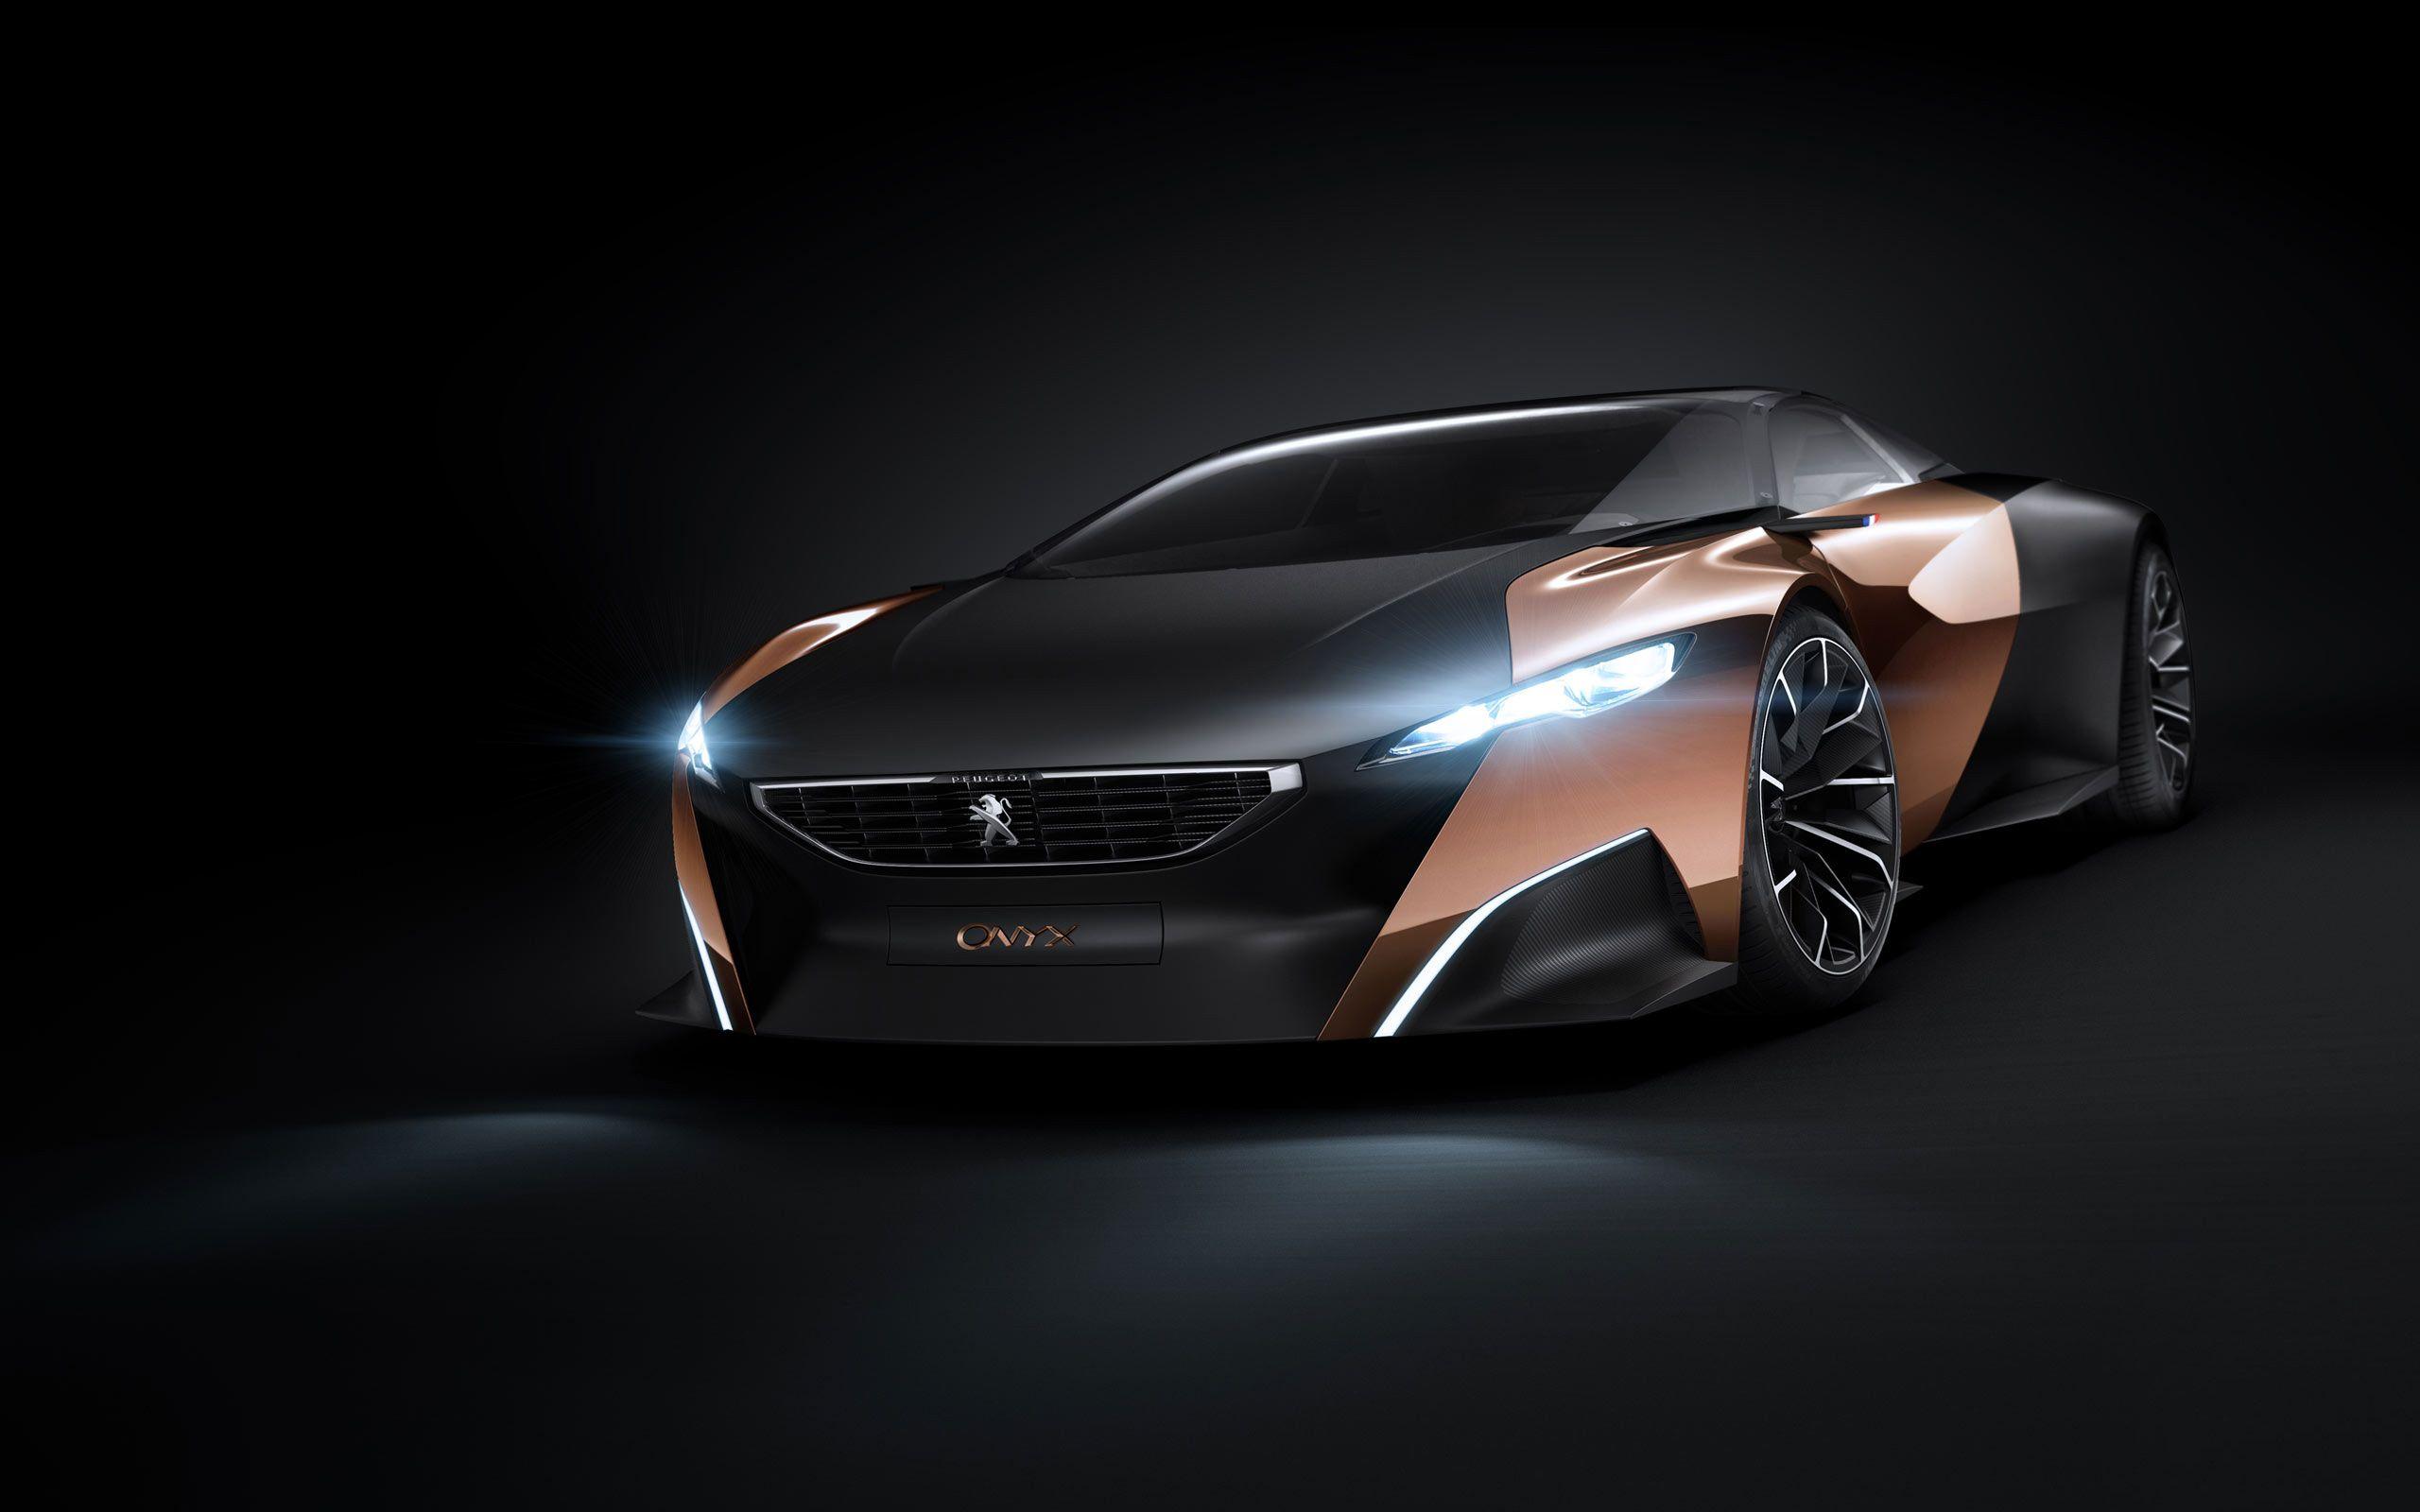 Peugeot Onyx Concept Car Ride With Me Concept Cars Car